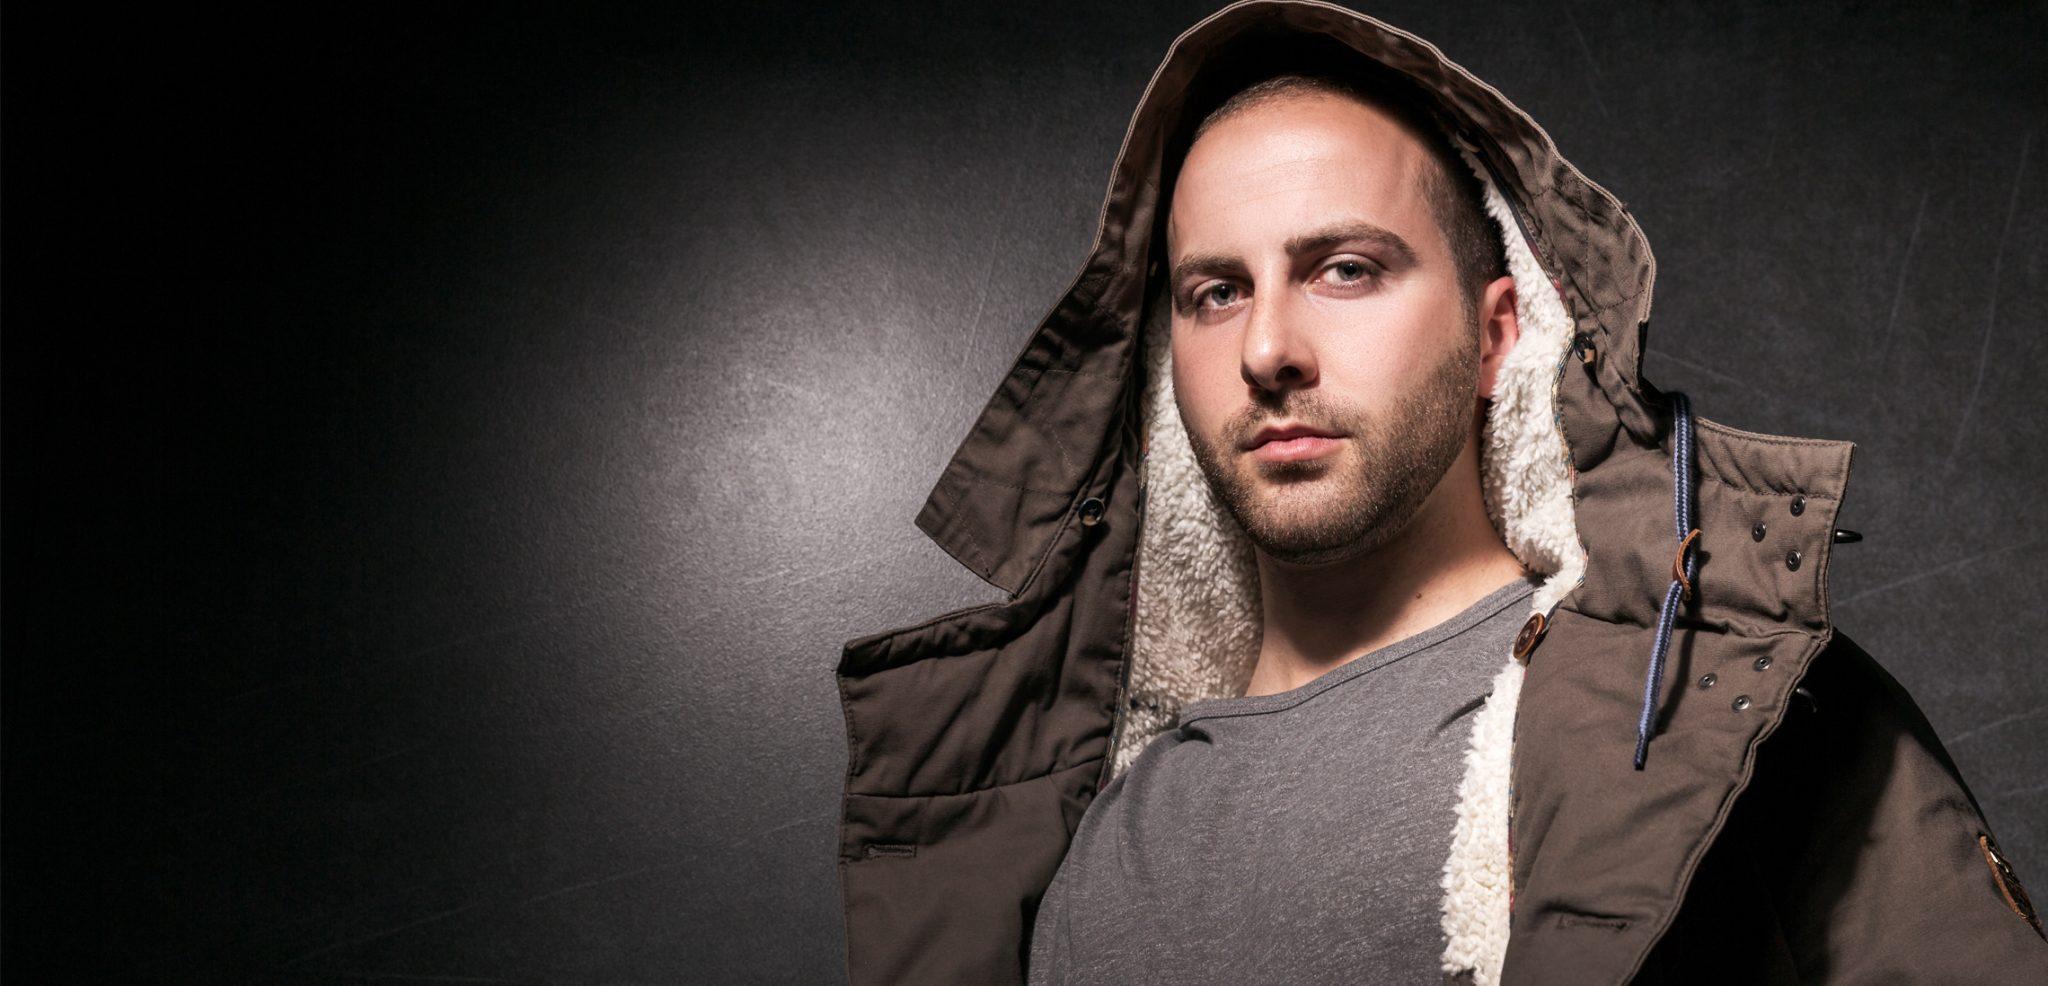 Ilario Liburni - Blister EP (Incl. Mihai Popoviciu Remix) hero